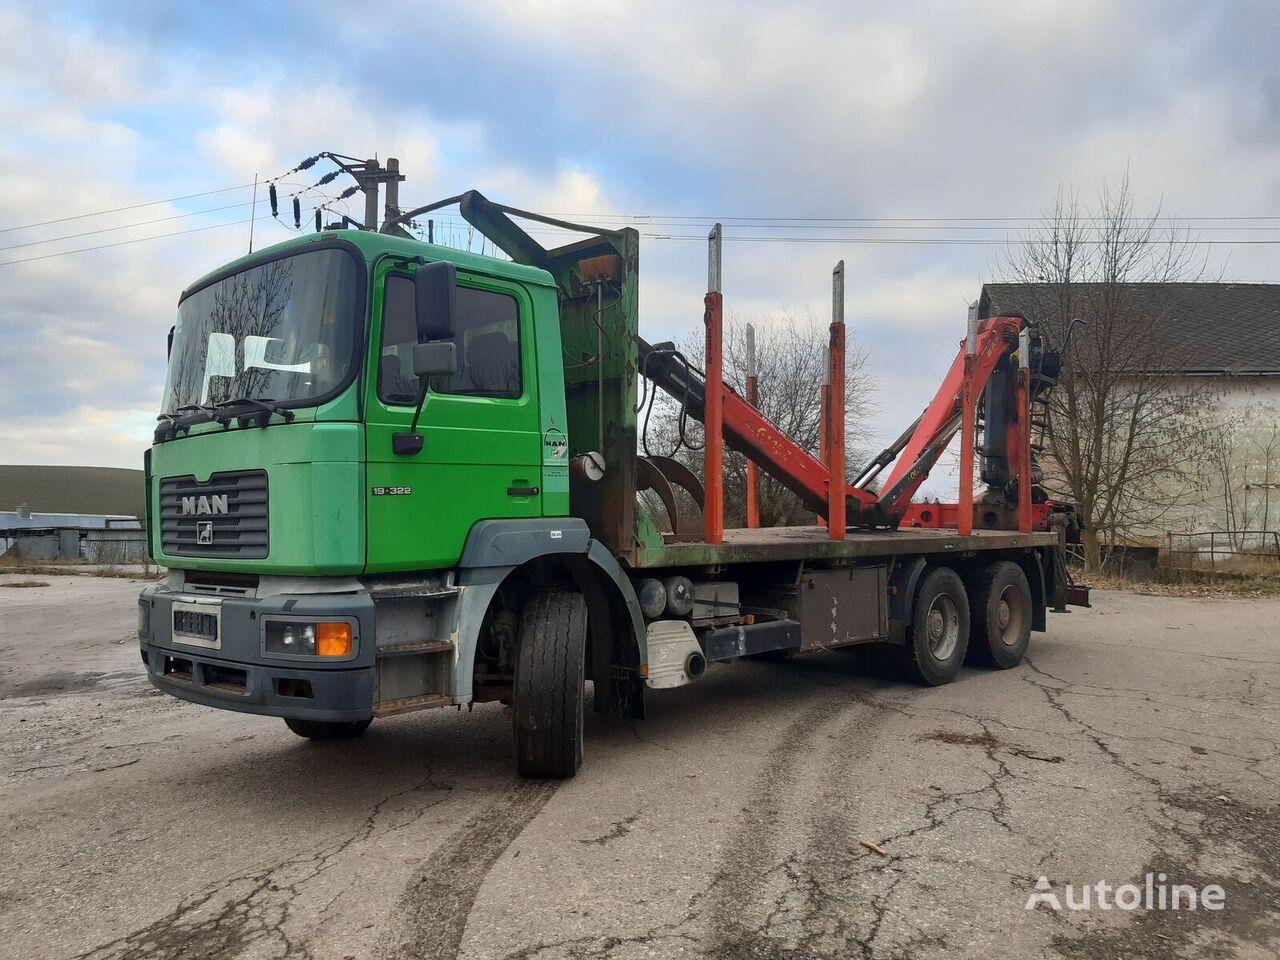 MAN F2000 timber truck